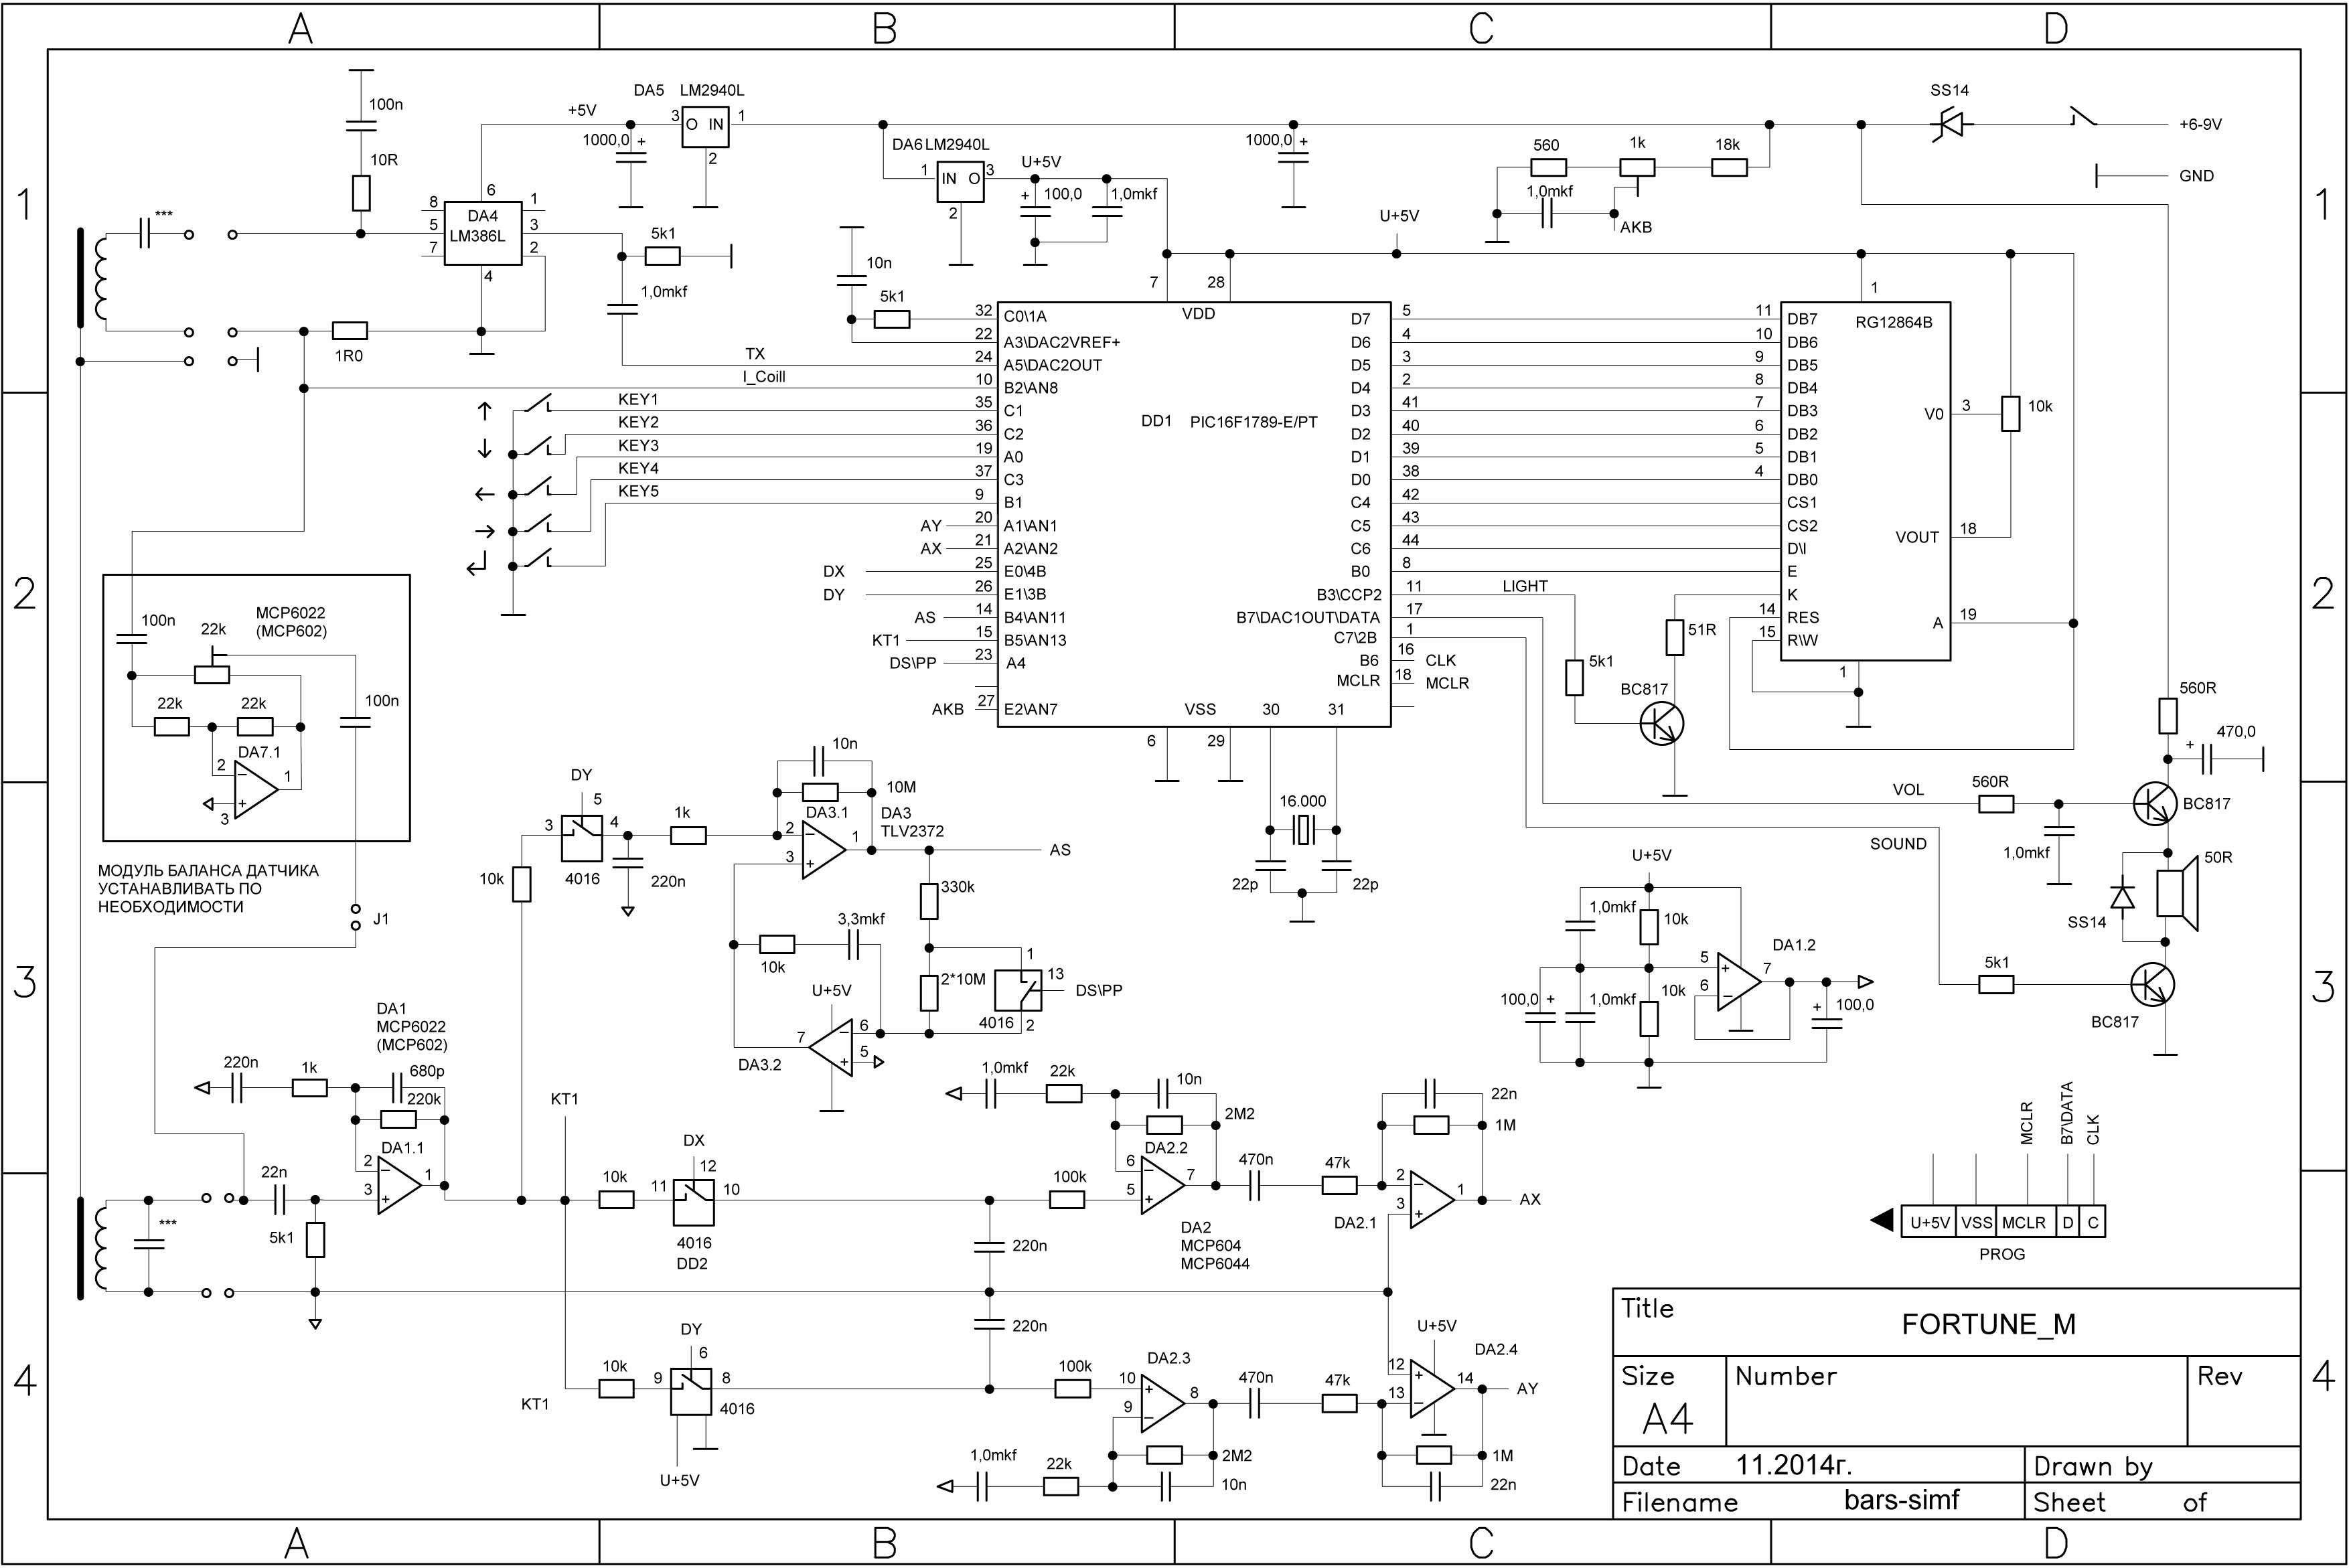 Металлоискатель Фортуна М (Fortuna M) схема)